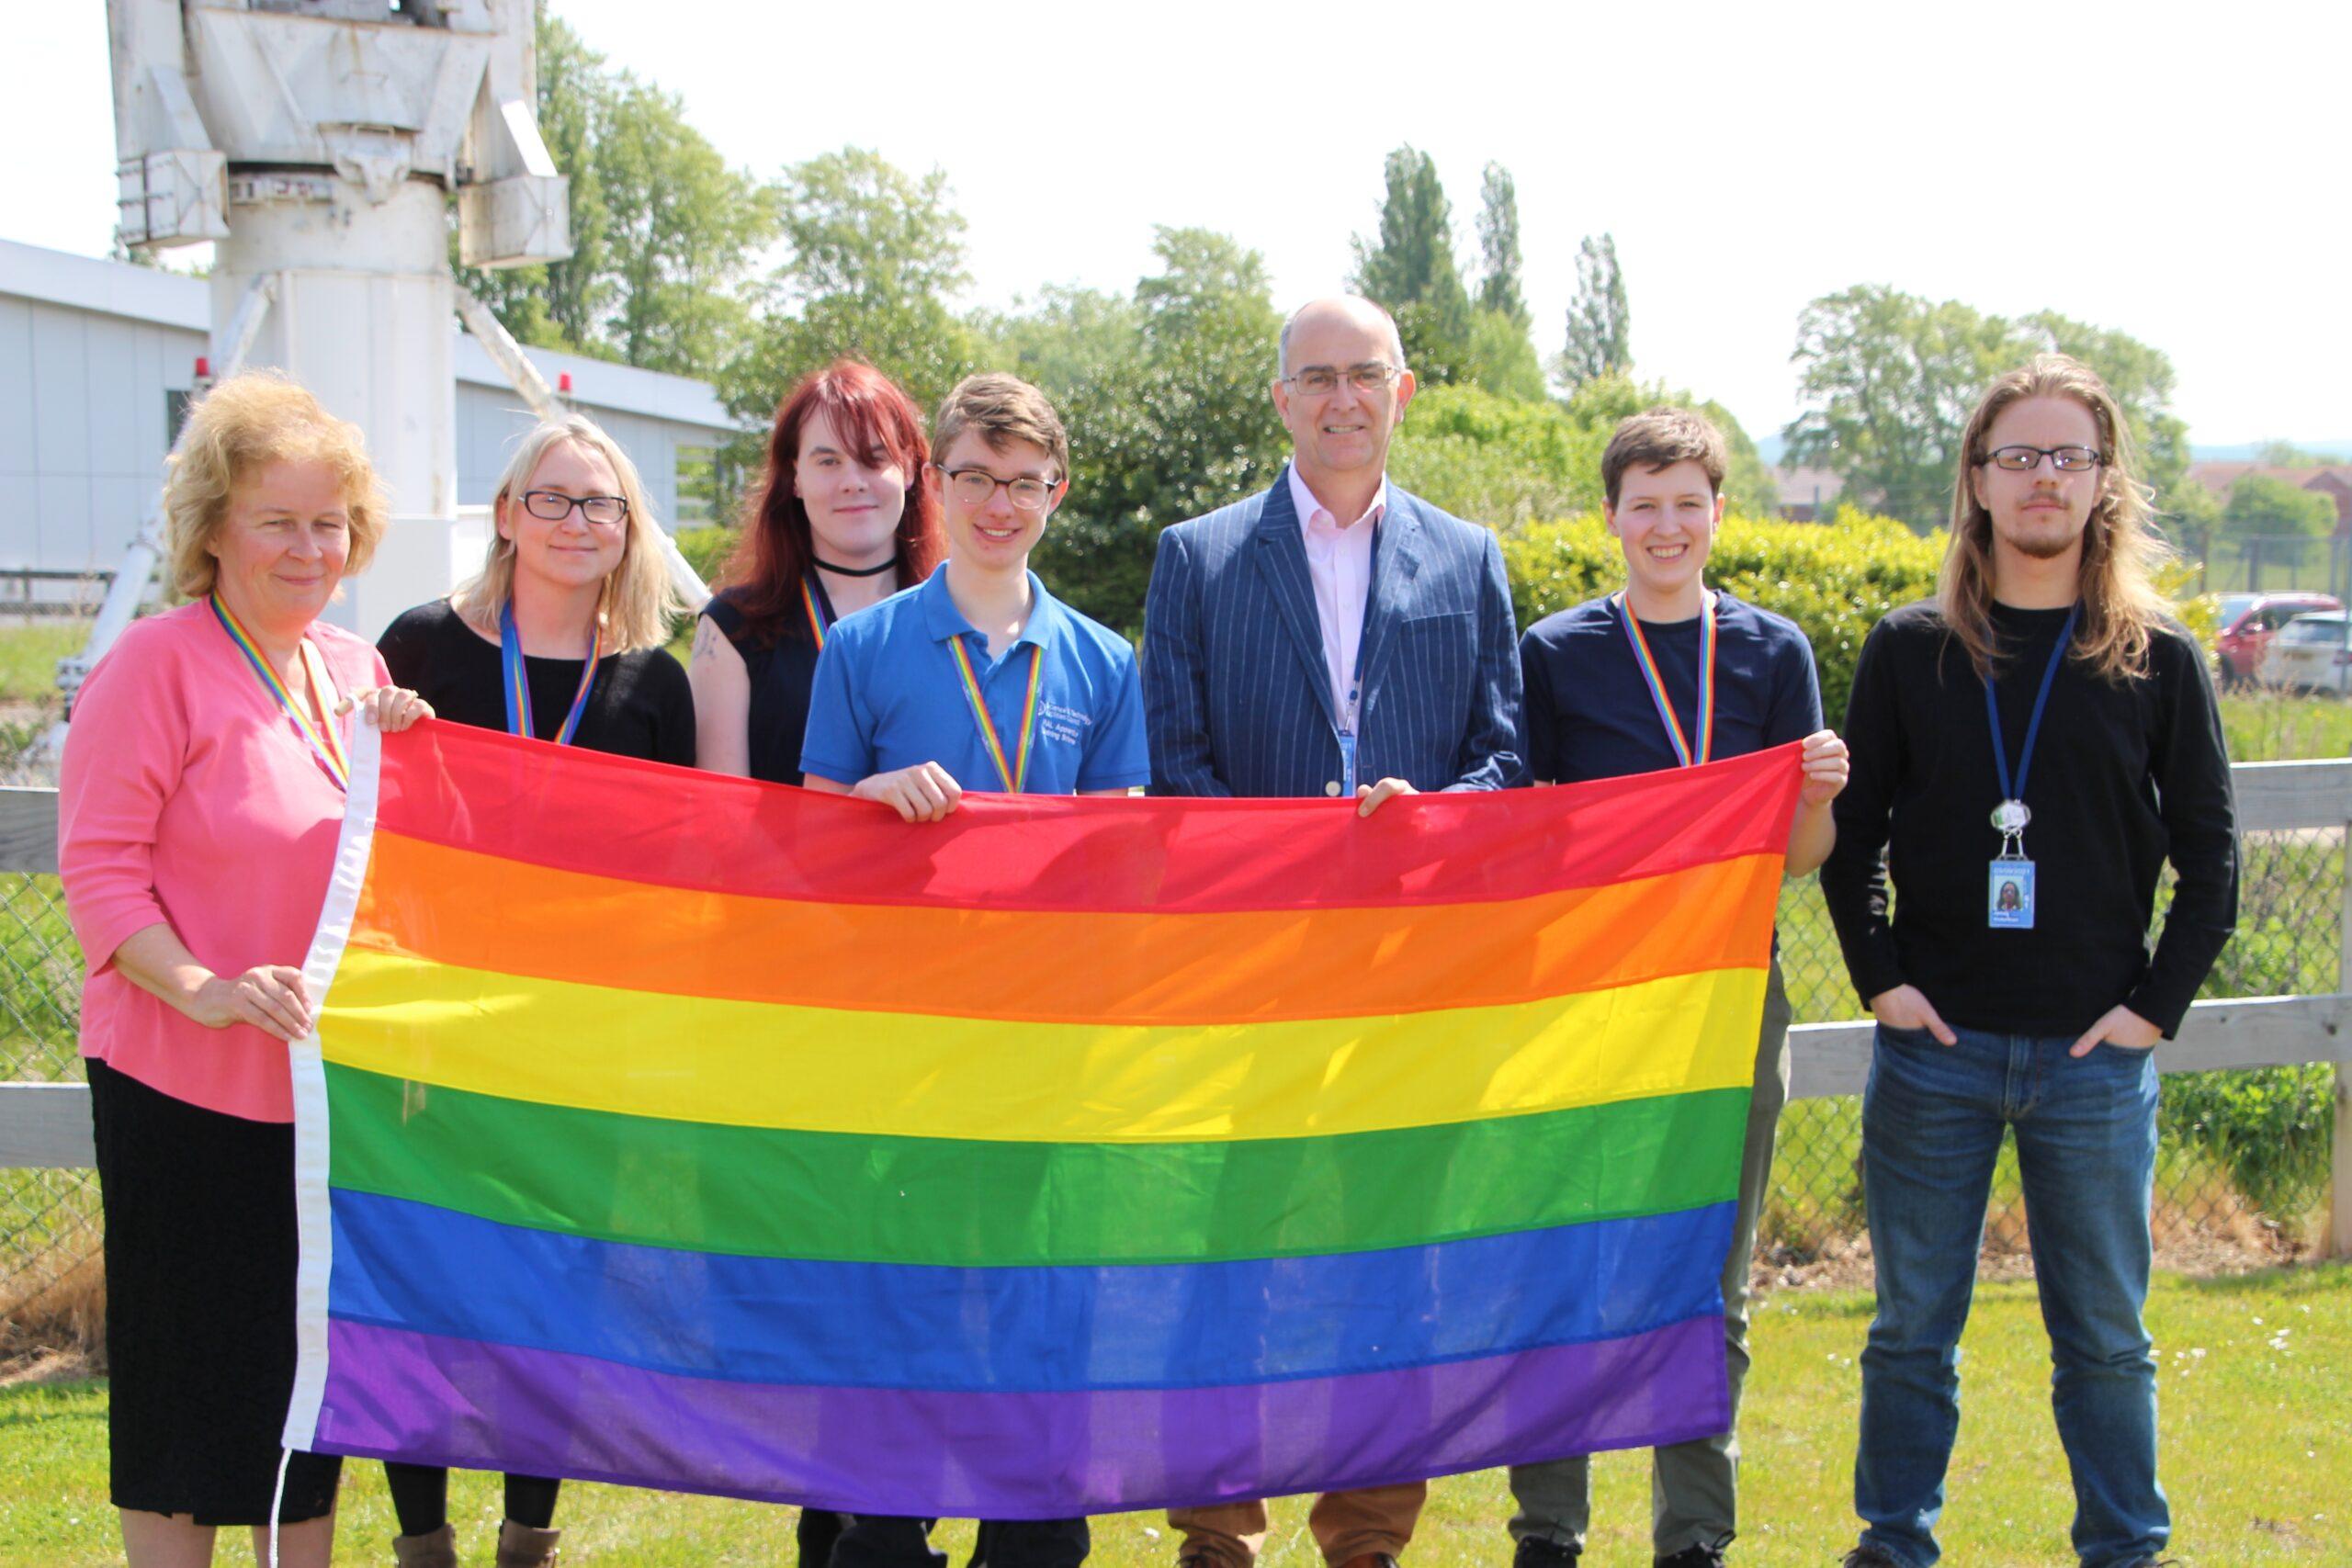 Spotlight Corporate: LGBTQ+ Group Meetings at RAL Space